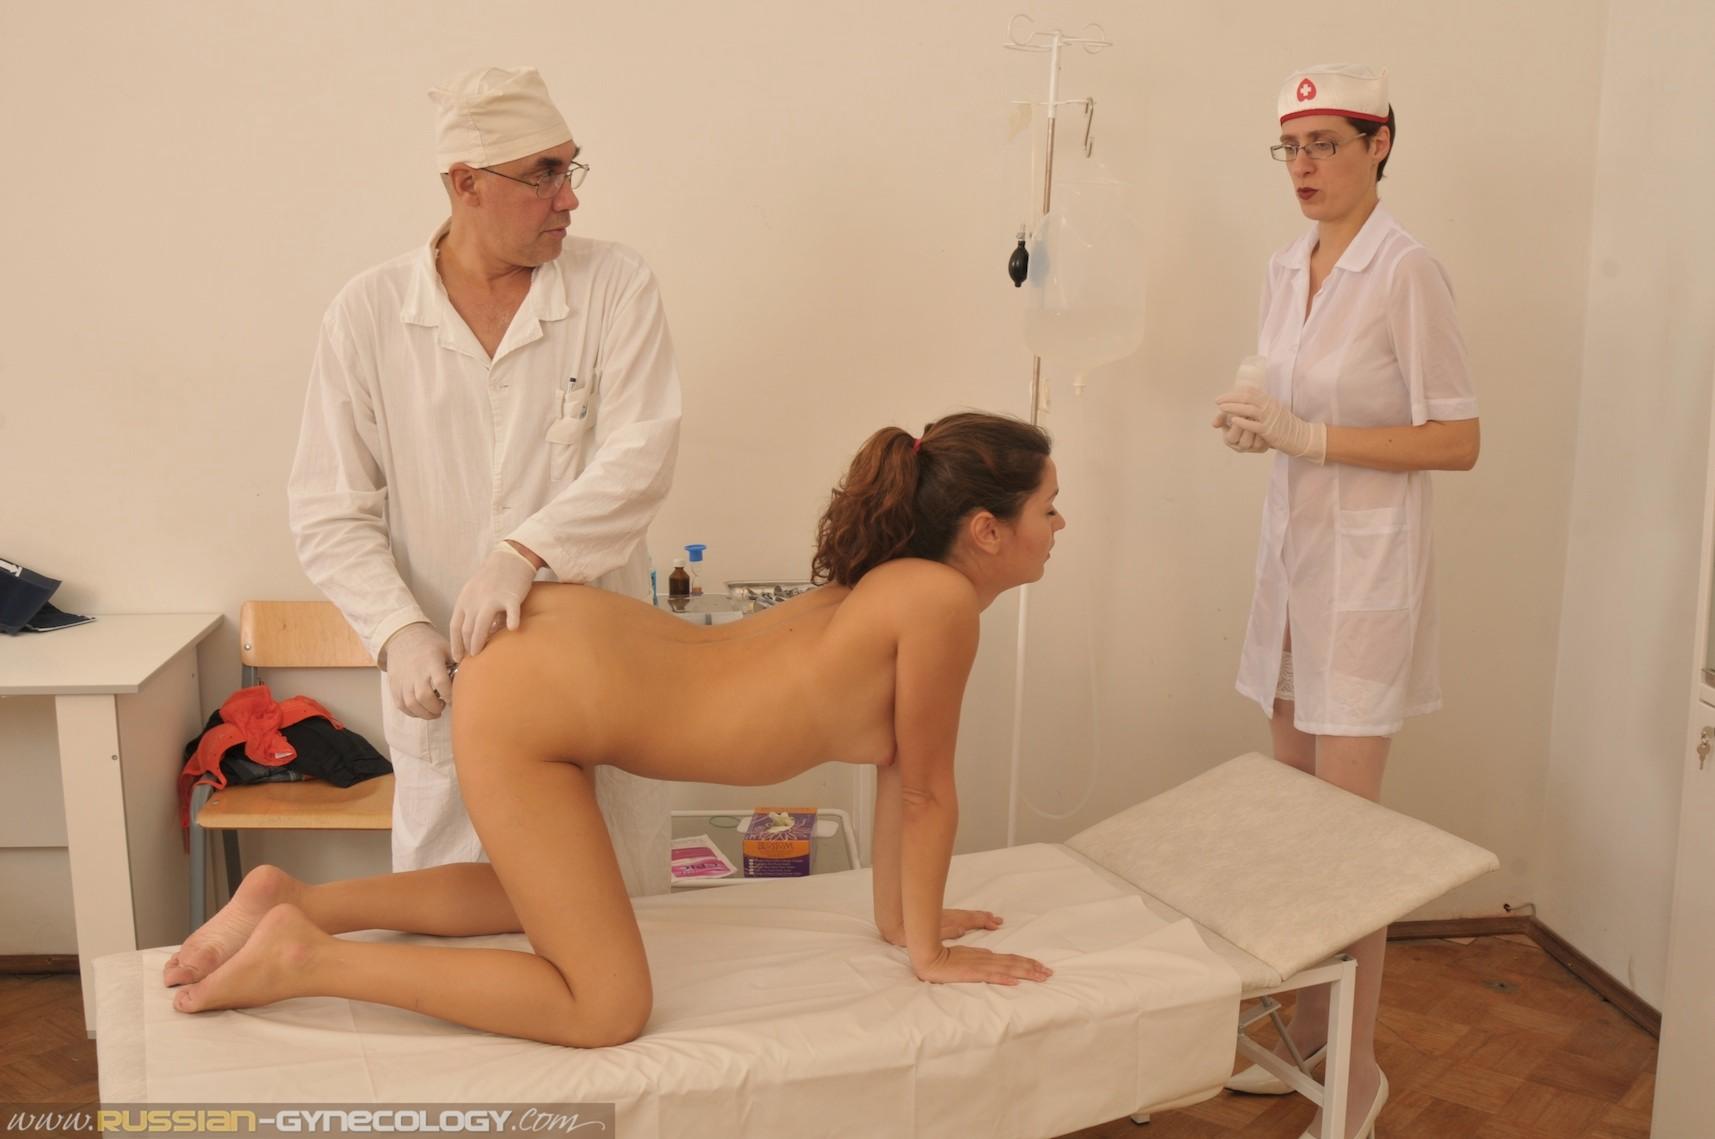 ginekolog-porno-obsledovanie